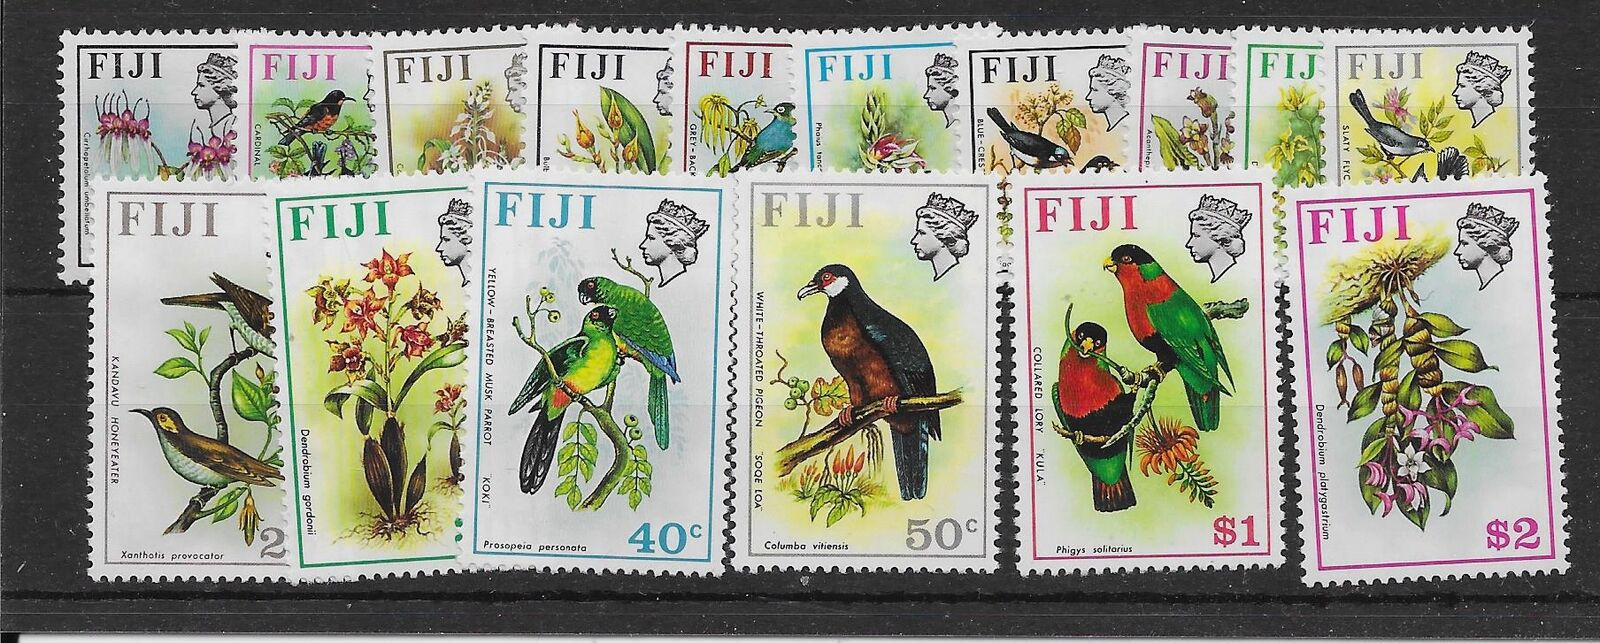 FIJI SG435/50 1971 BIRDS/FLOWERS DEFINITIVE SET MNH